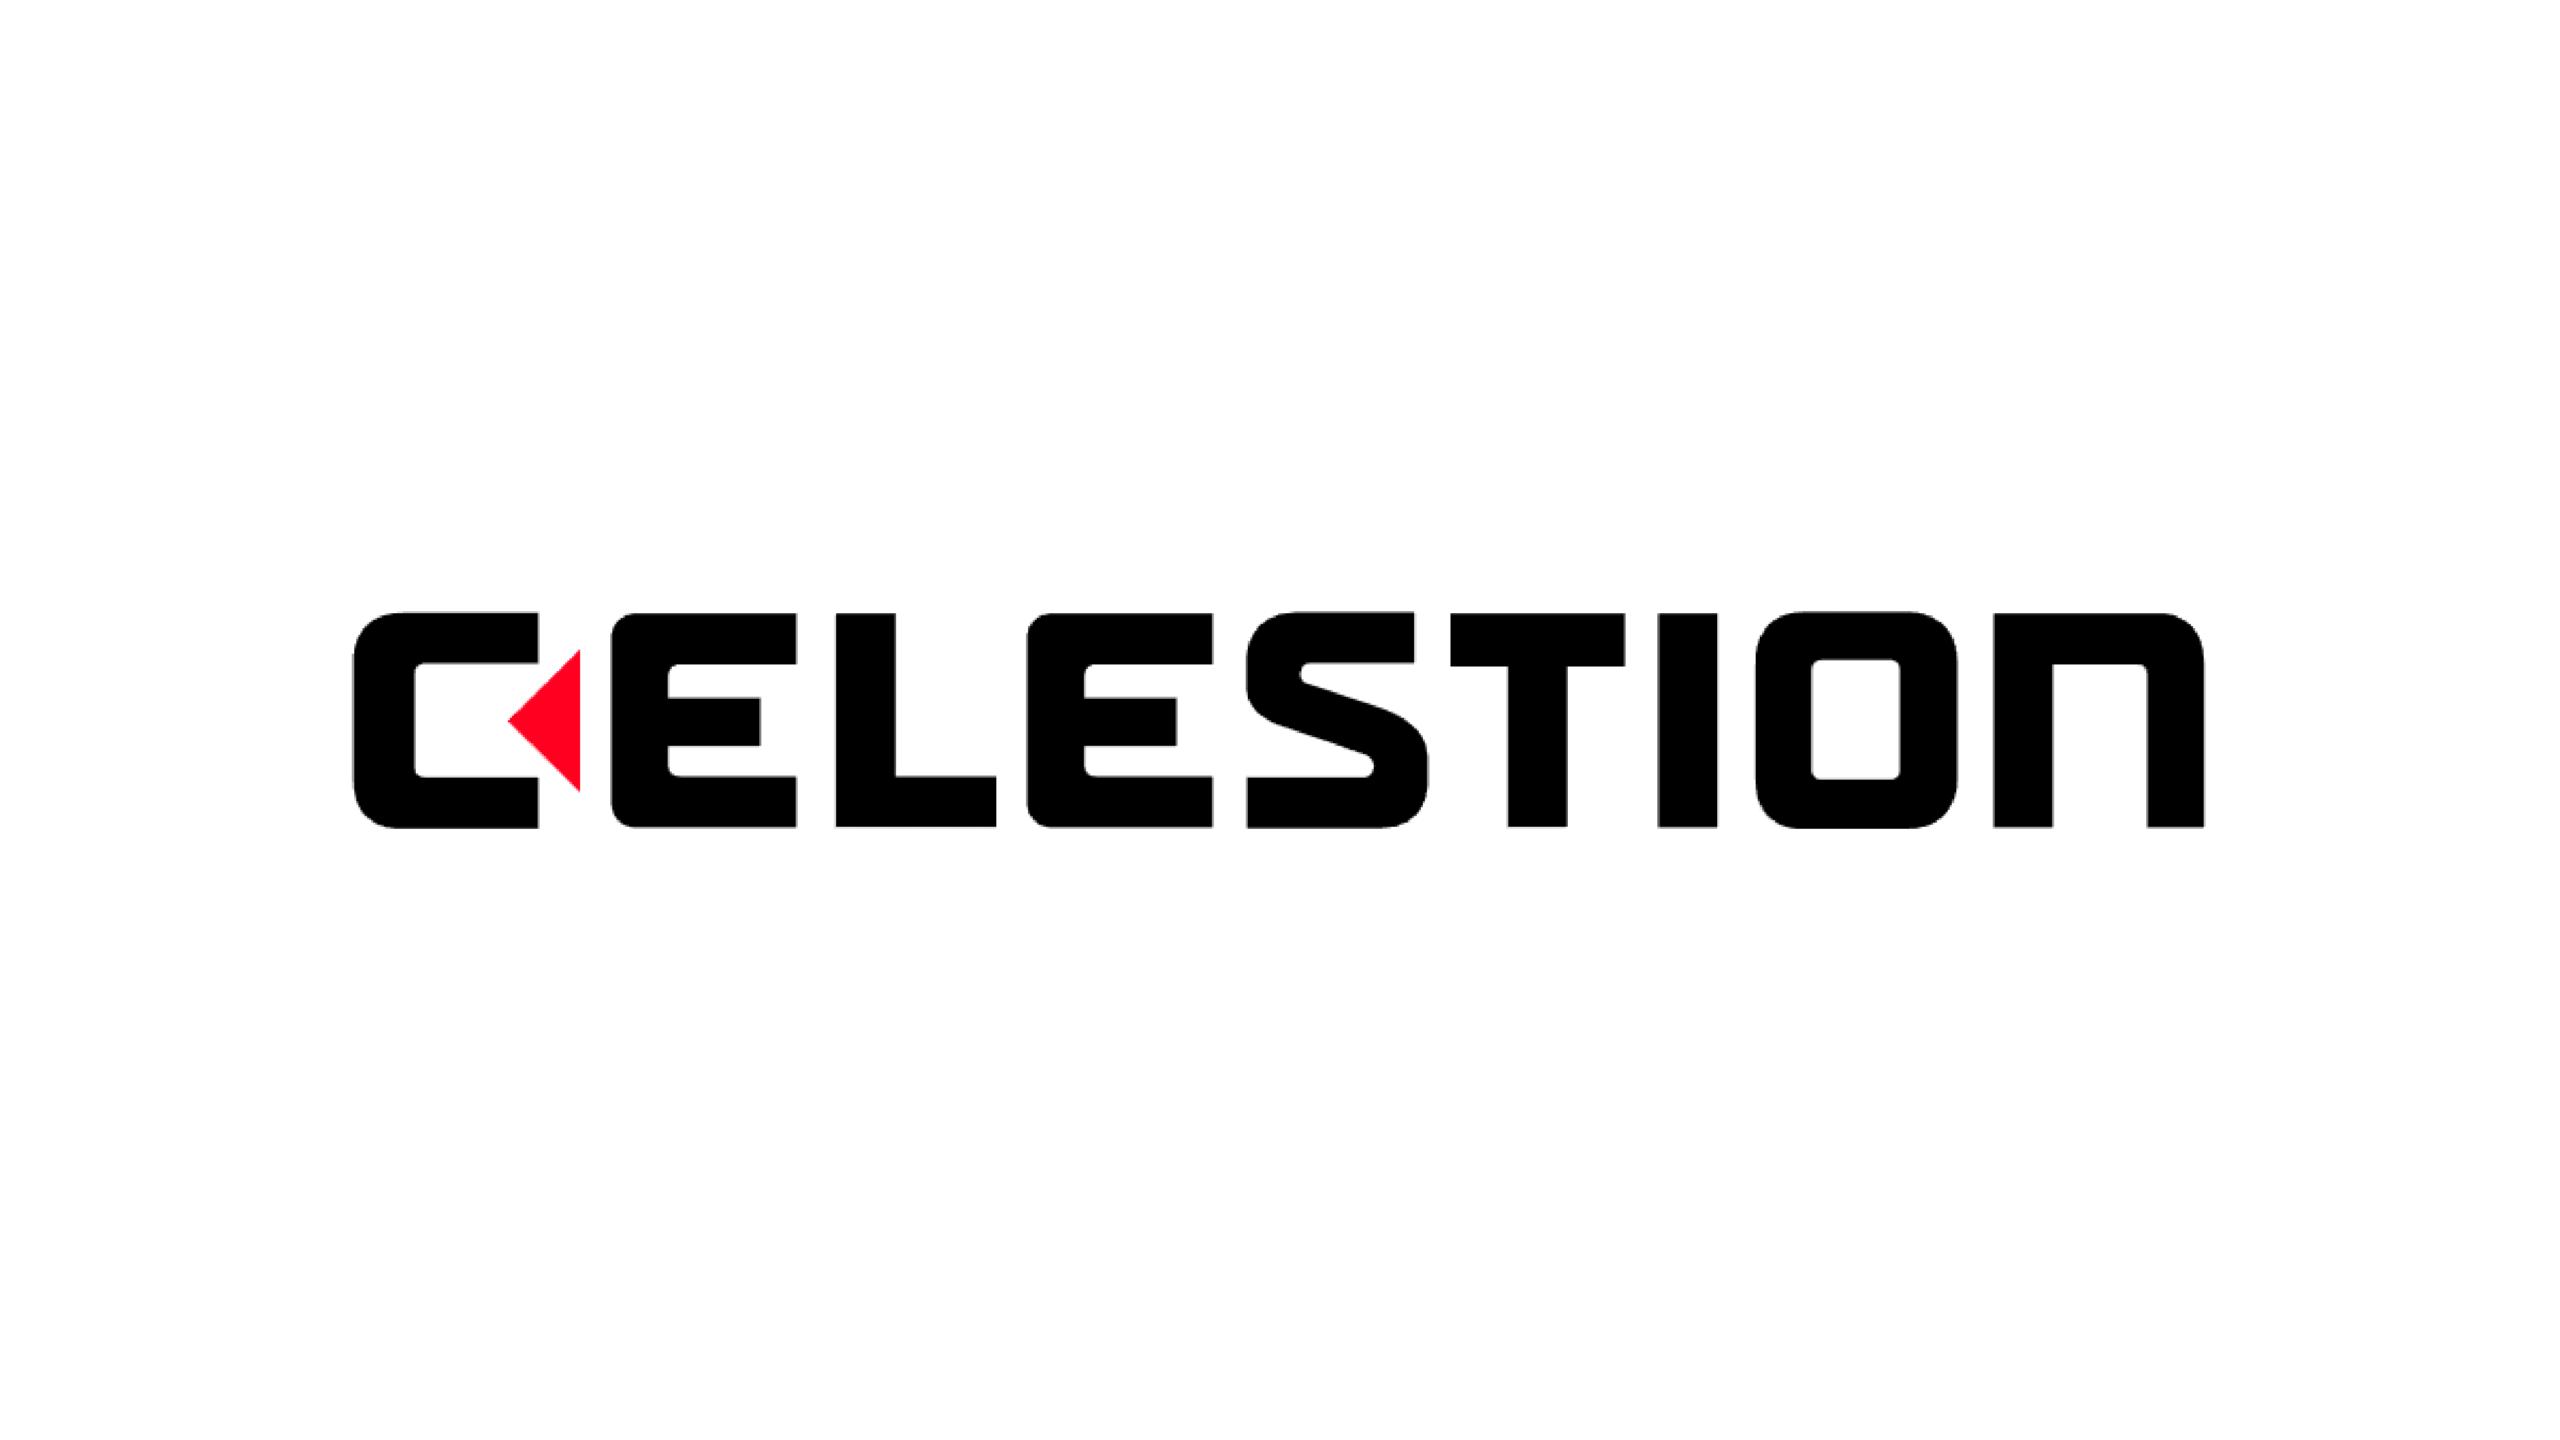 Celestion International Ltd., GP Acoustics (UK) Ltd-01., KEF logo